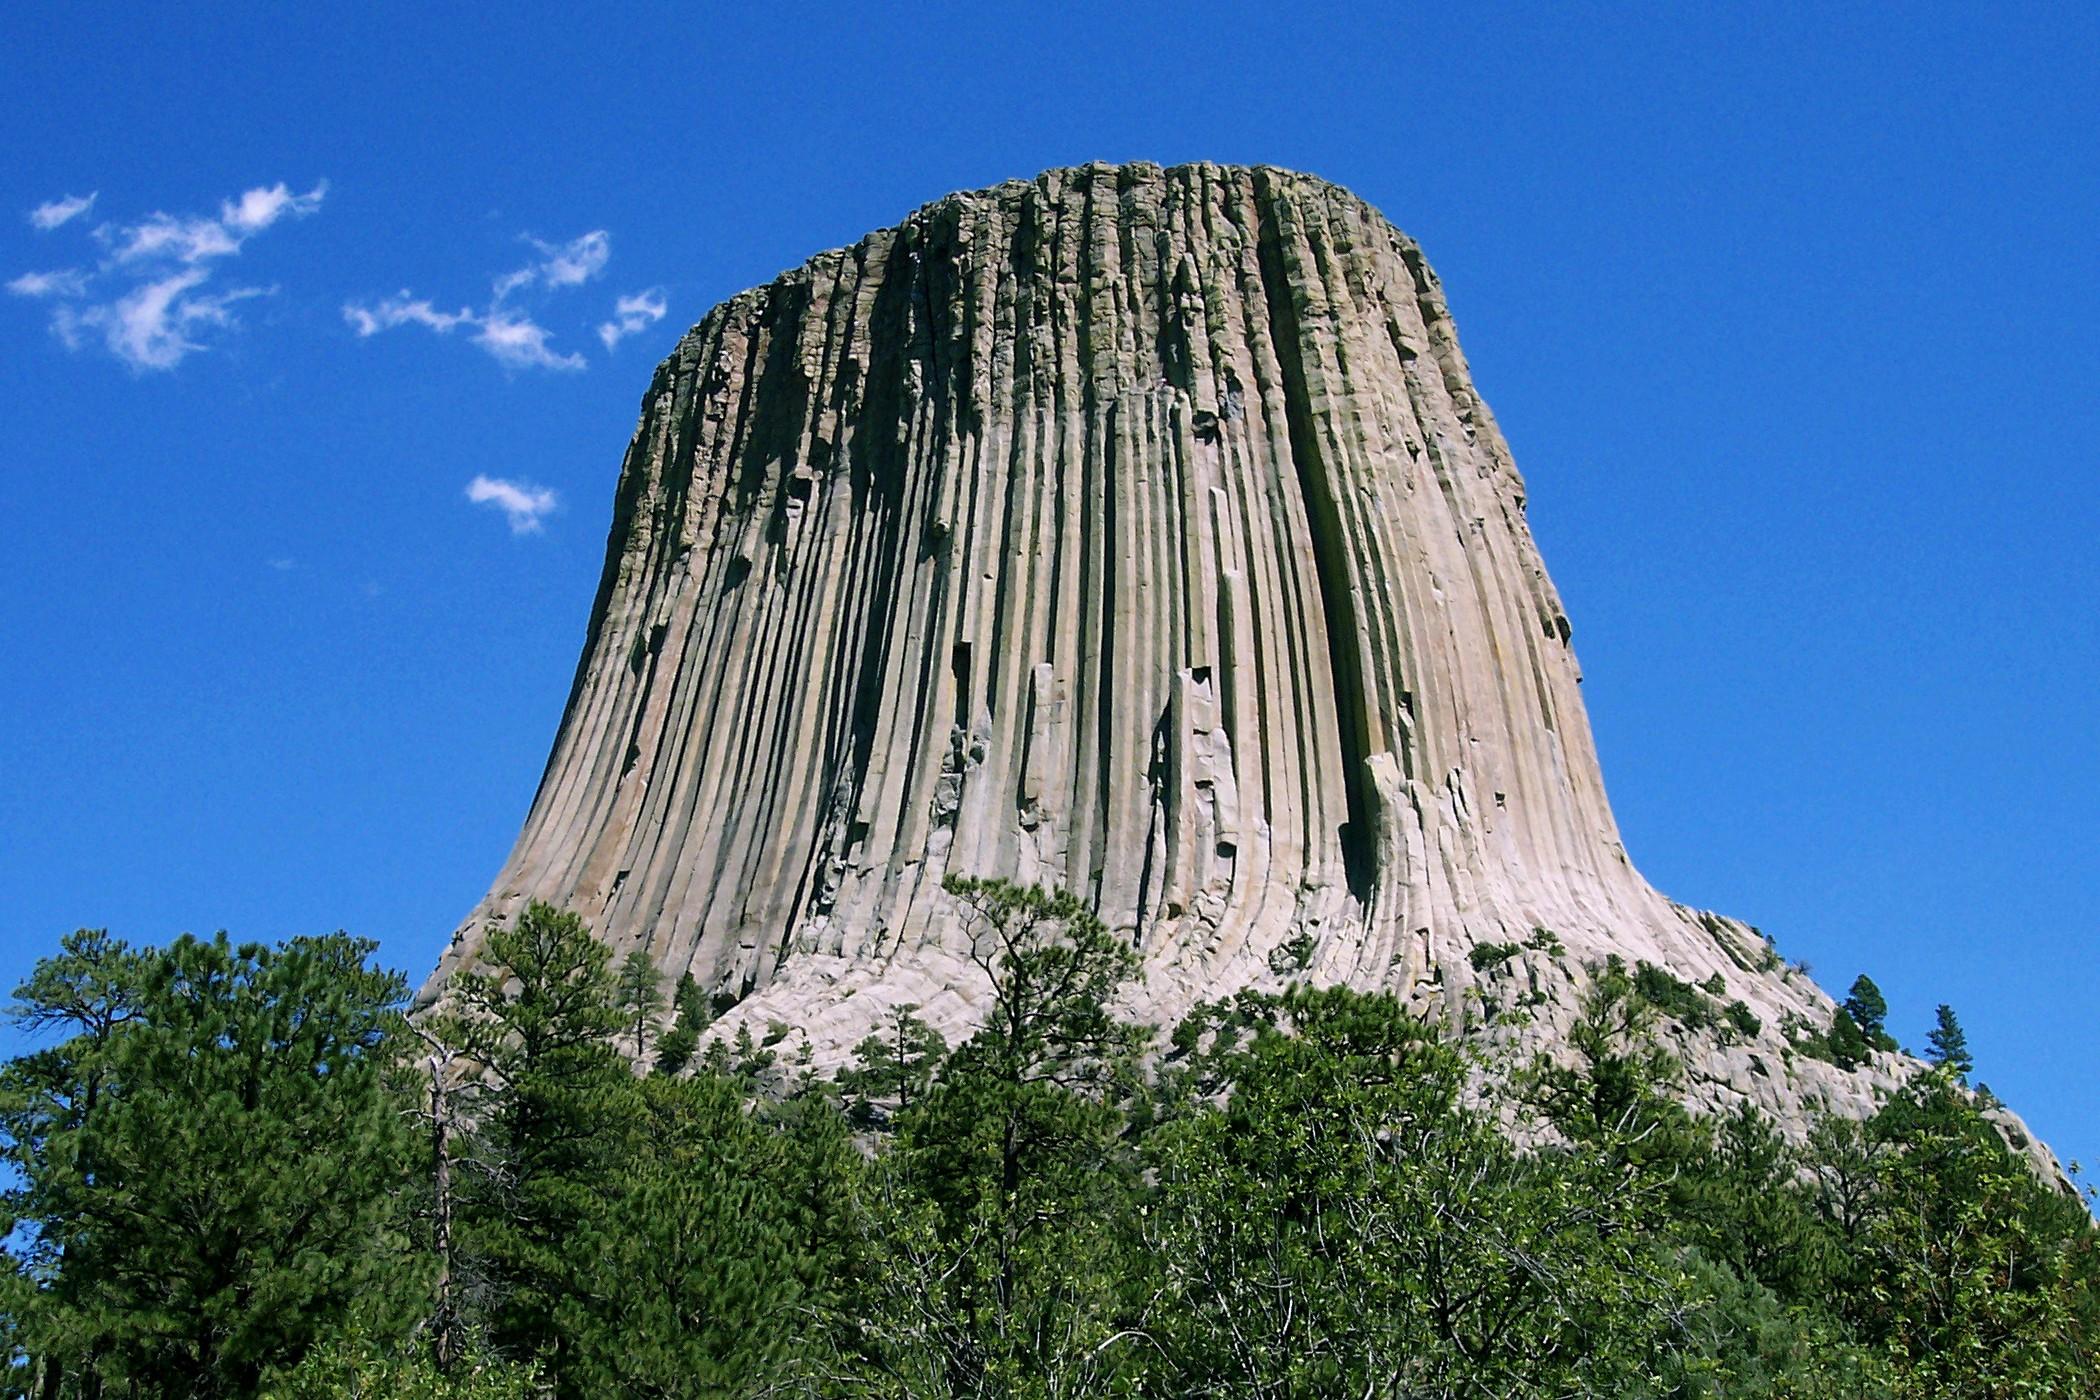 https://i1.wp.com/upload.wikimedia.org/wikipedia/commons/4/46/Devils_Tower_CROP.jpg